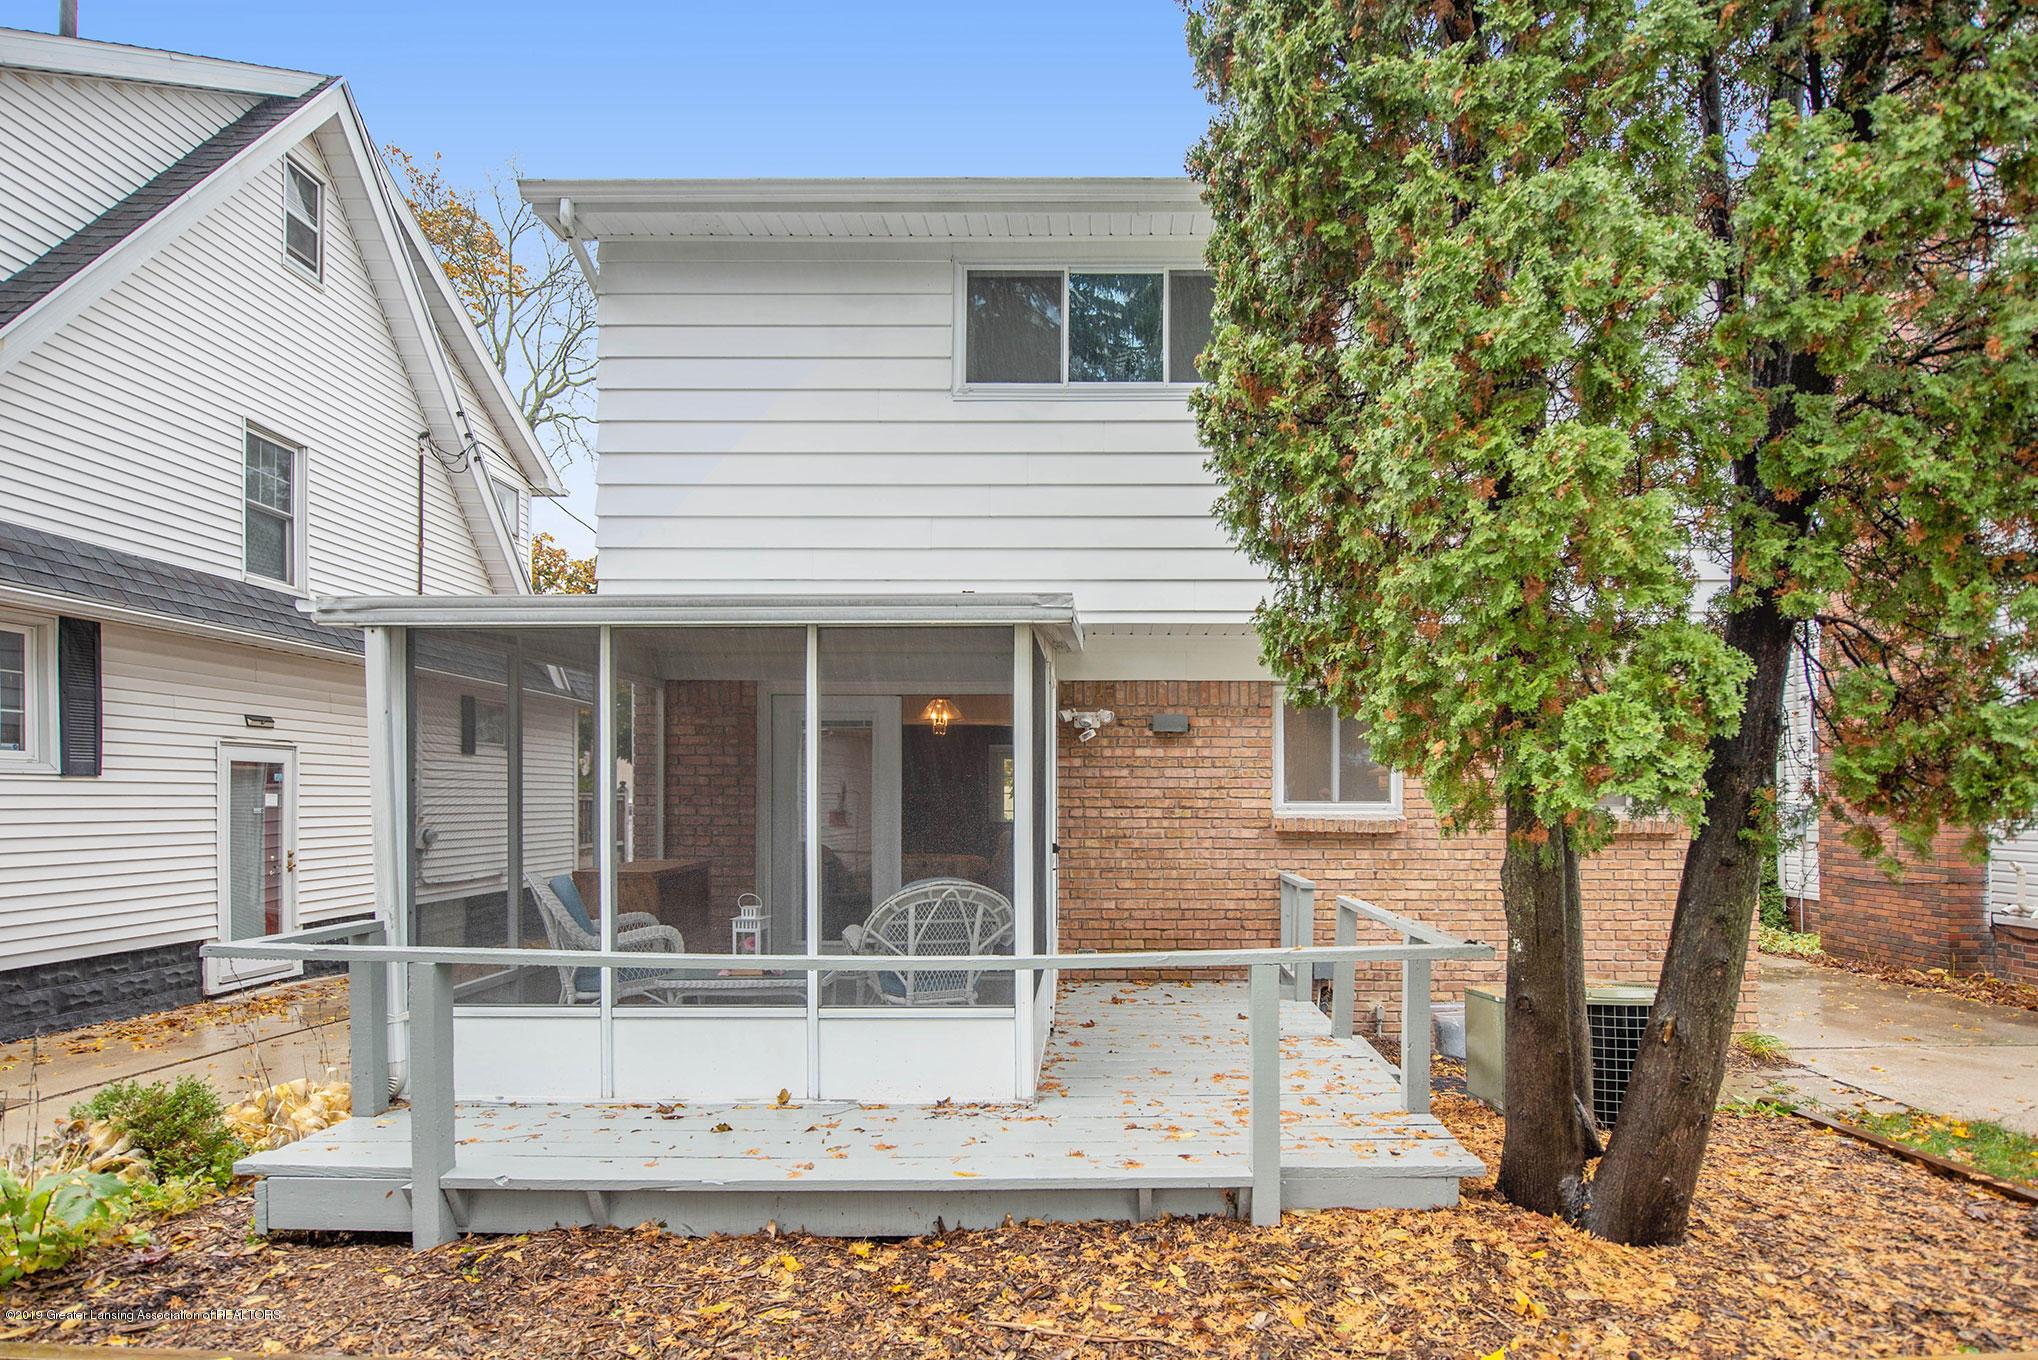 801 Merrill Ave - Exterior - 18